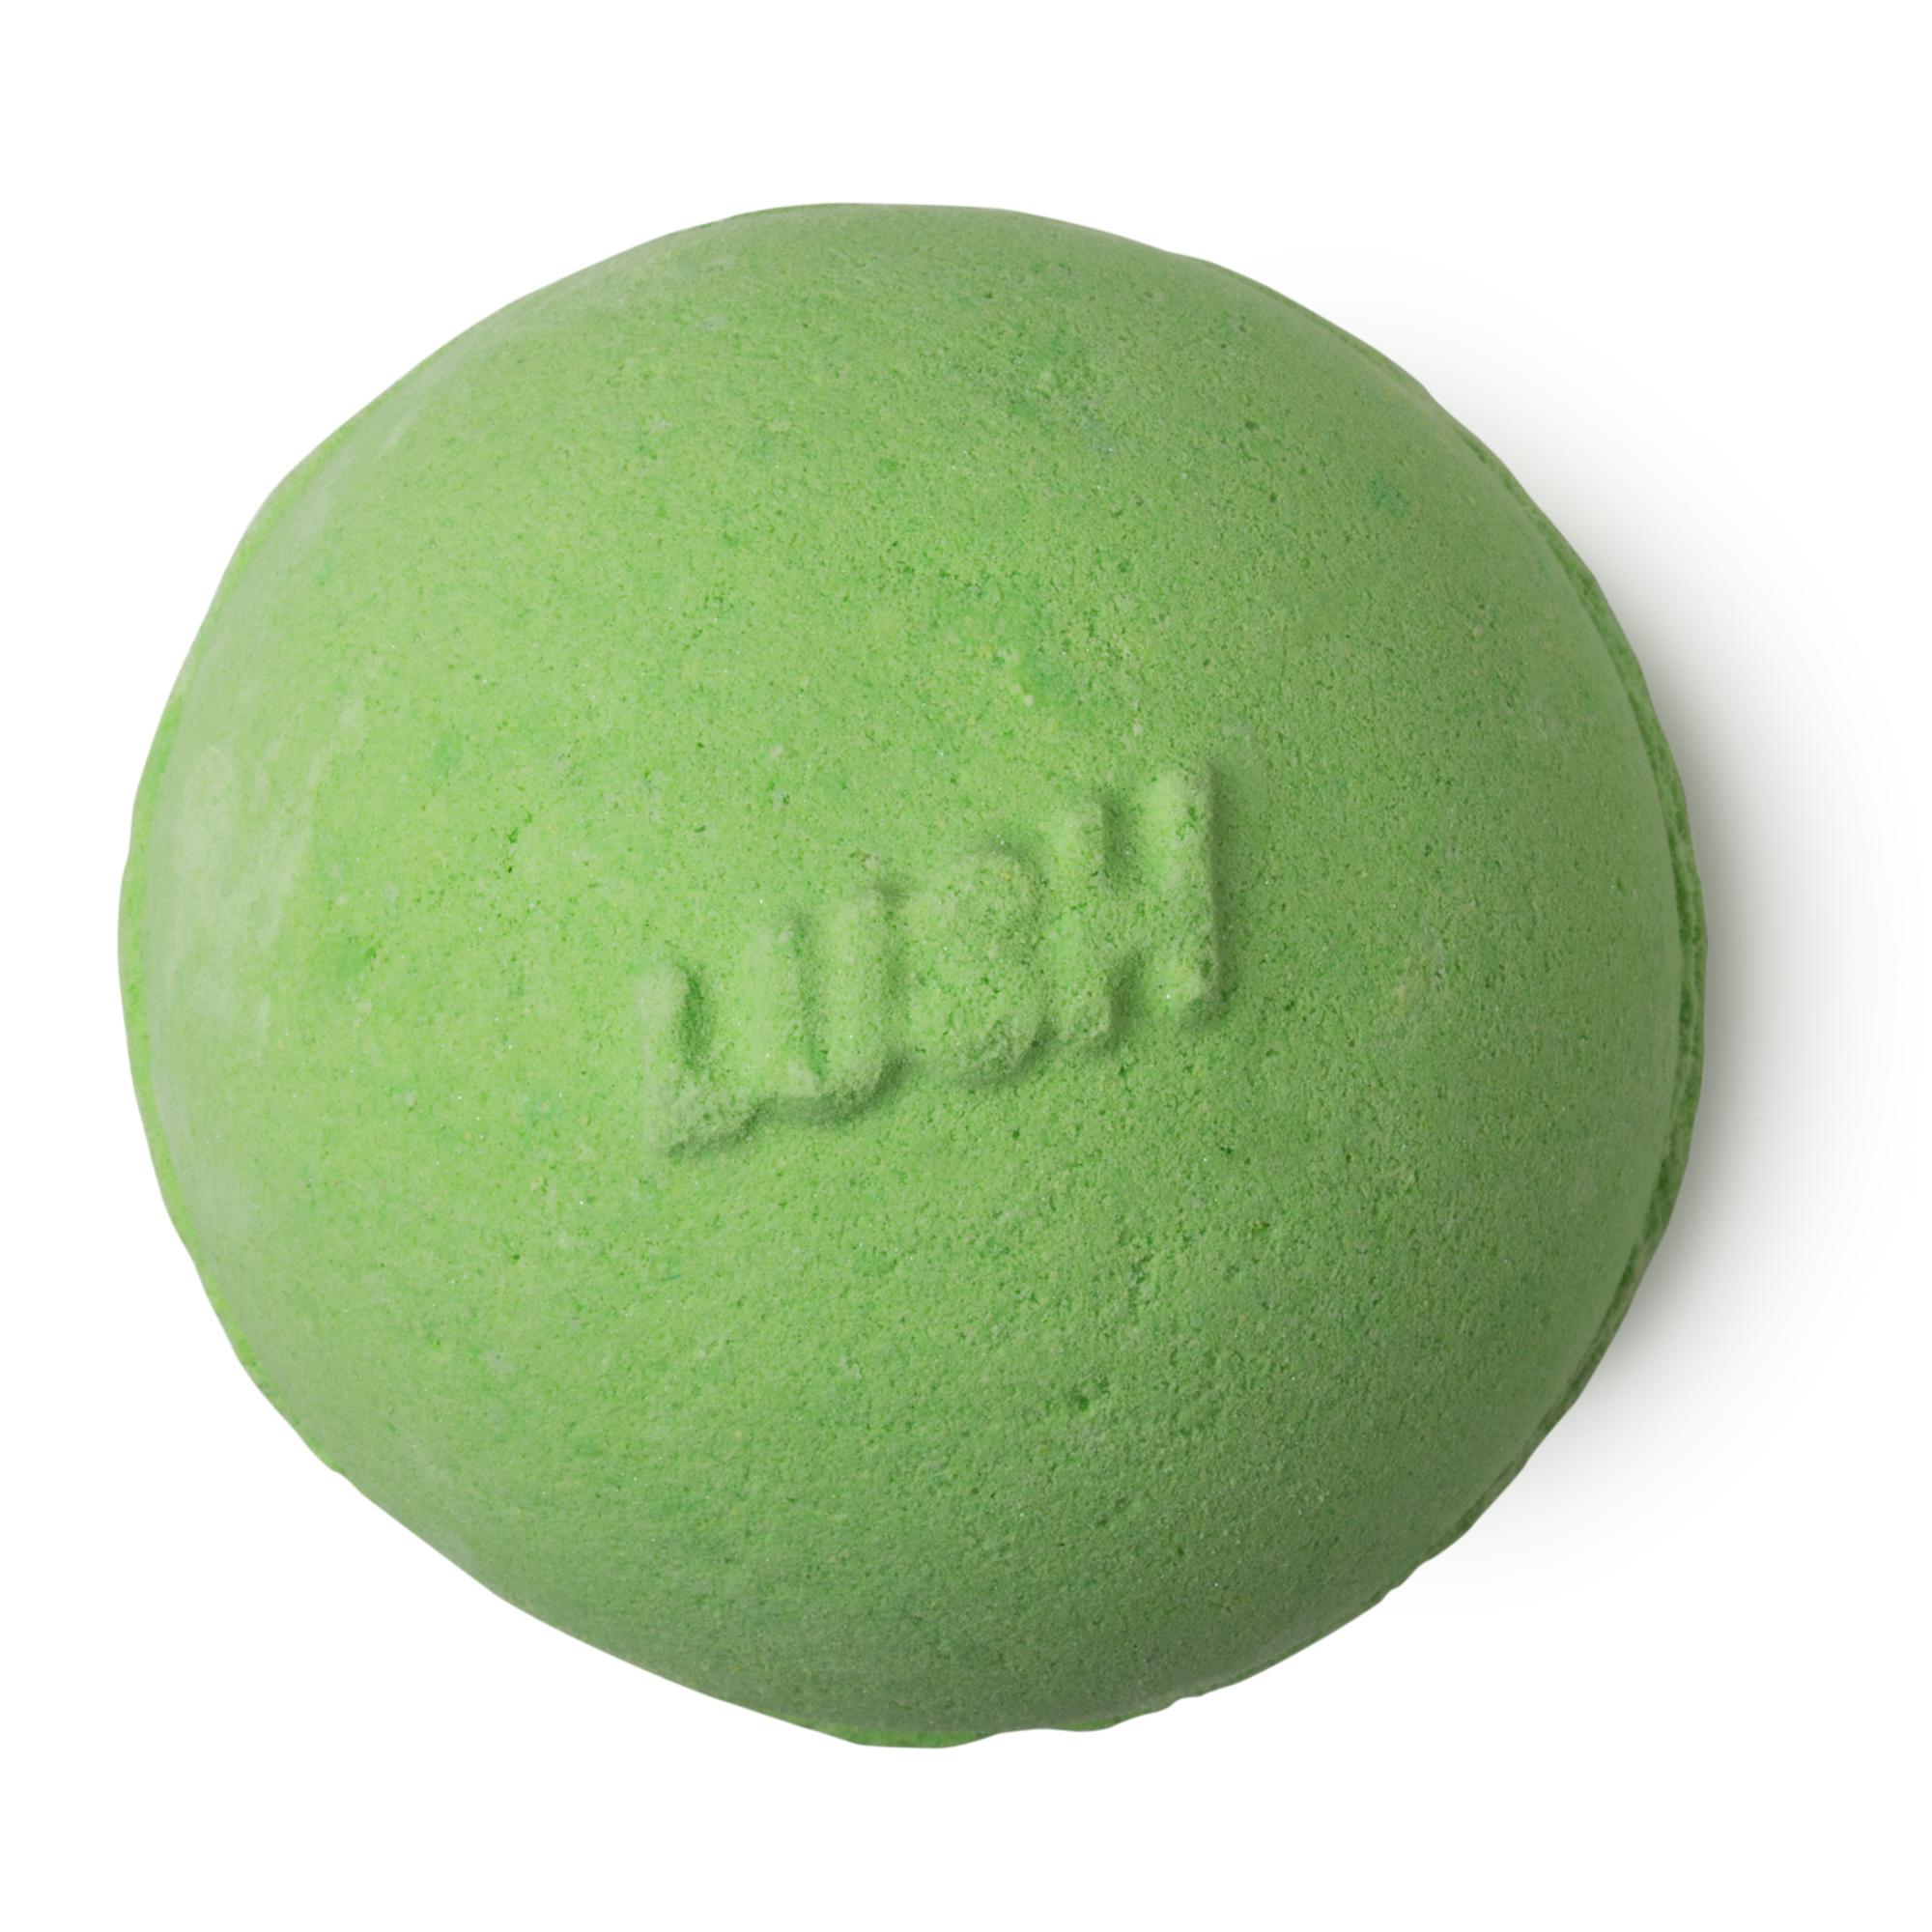 Avobath Bath Bombs Lush Cosmetics Australia